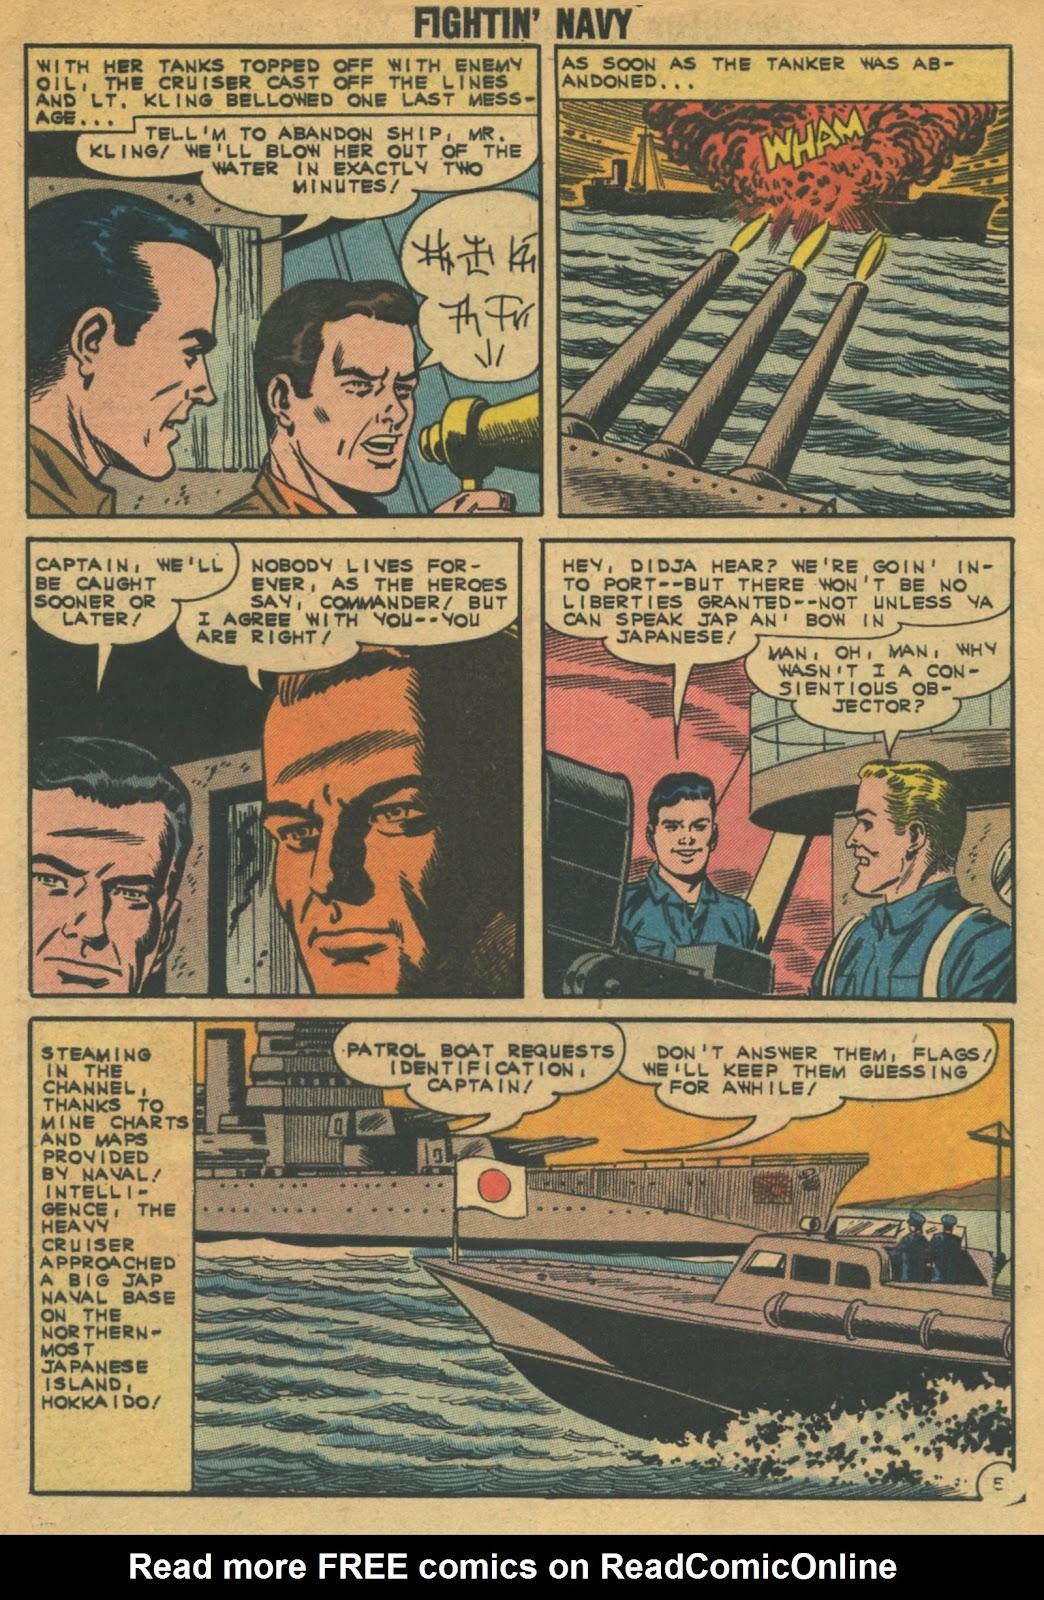 Read online Fightin' Navy comic -  Issue #103 - 8